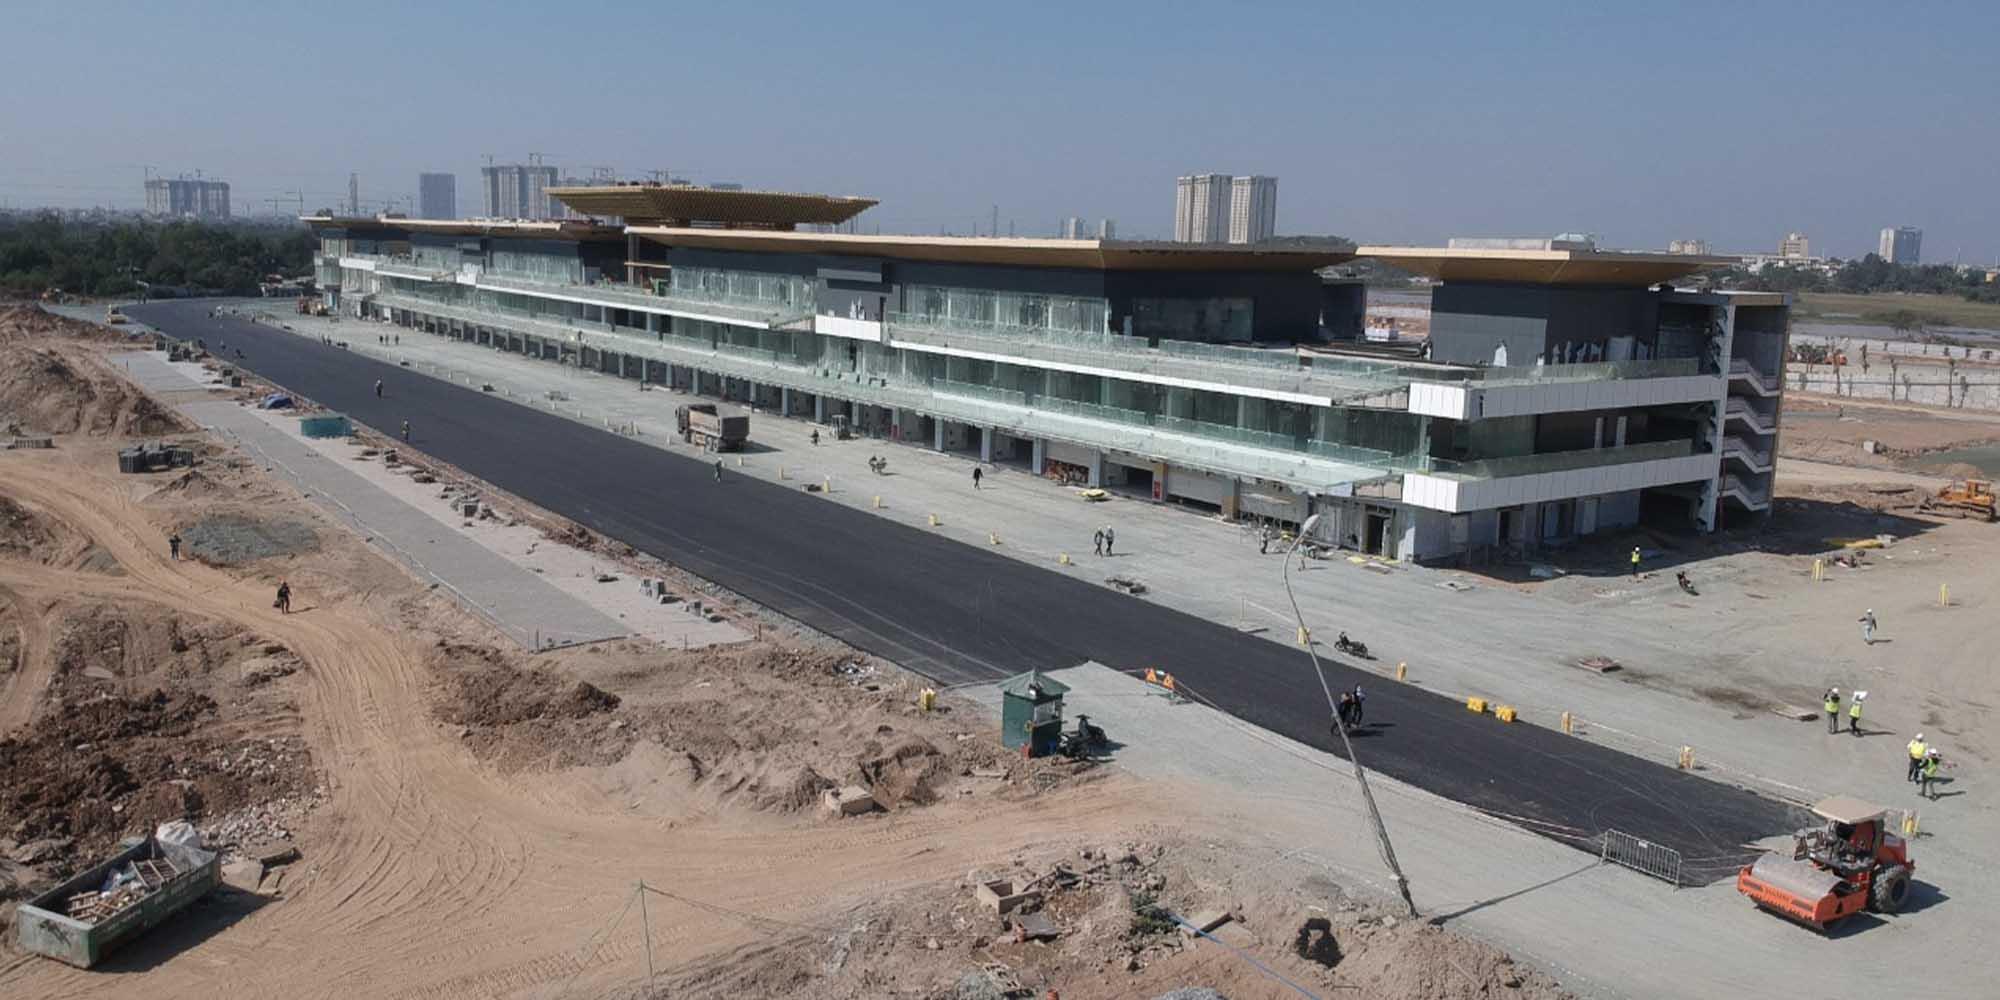 Hanoi circuit: pit building complete ahead of 2020 Vietnamese GP